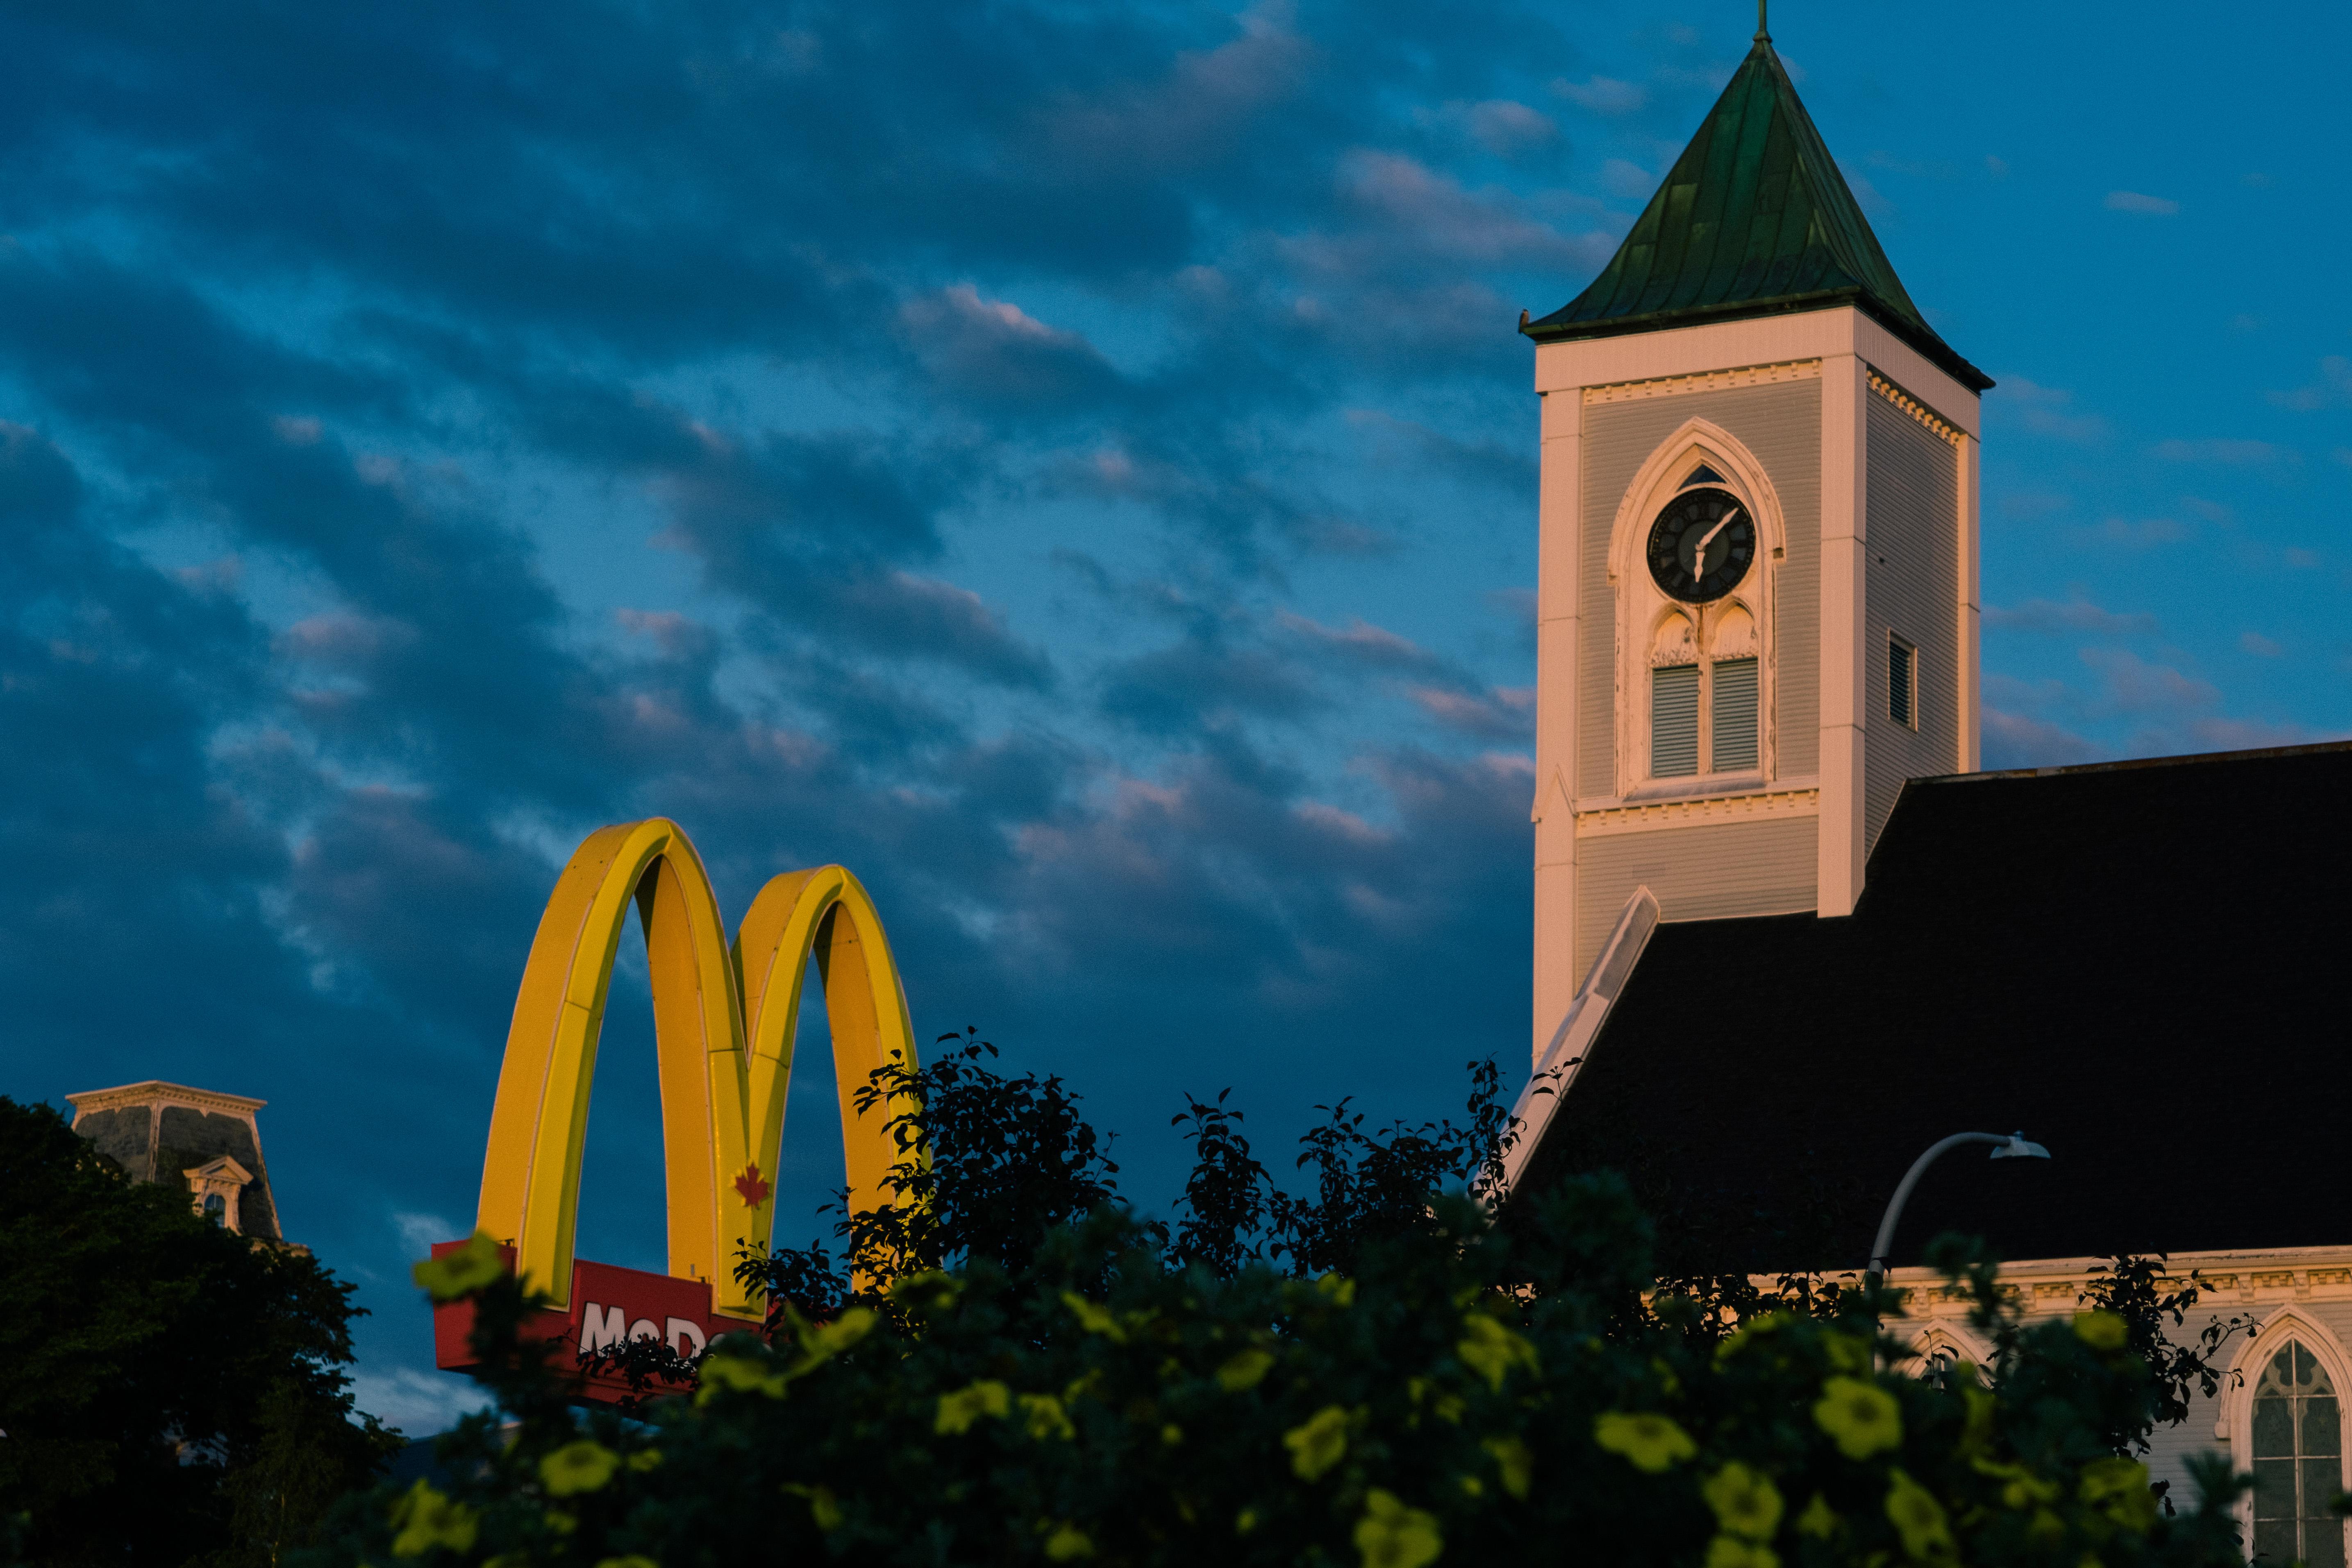 Mcdonalds Sign and Church Morning Light